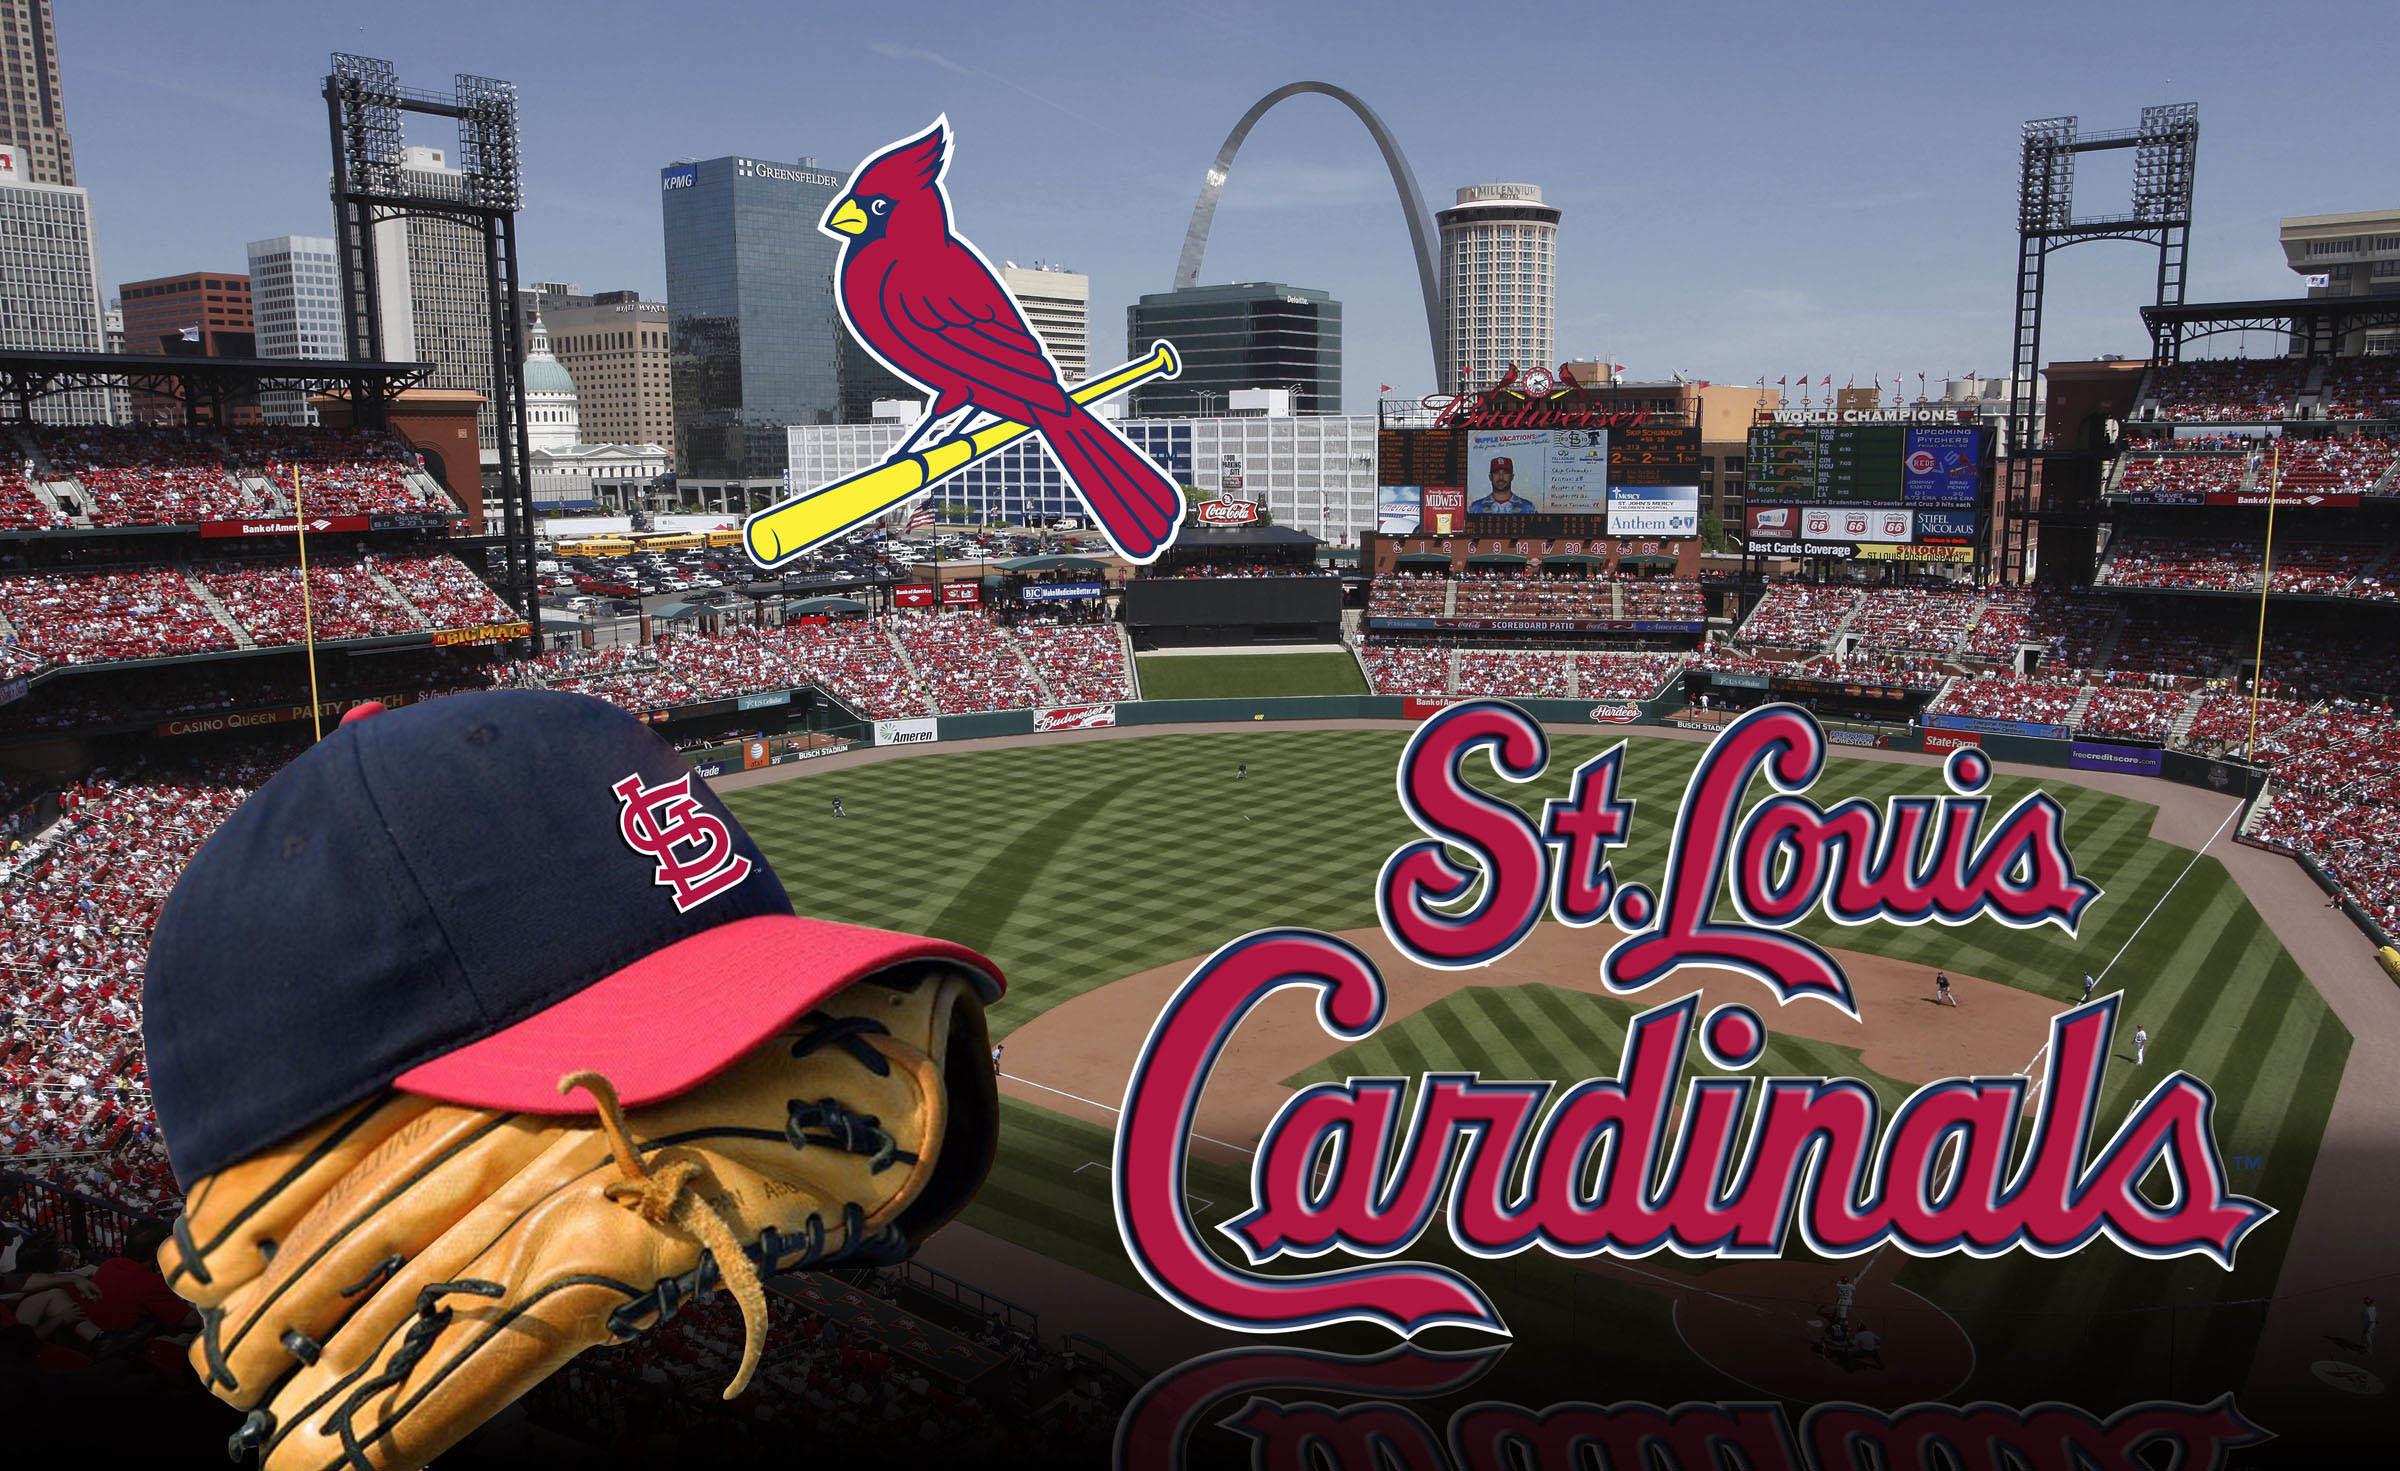 MLB St. Louis Cardinals wallpaper